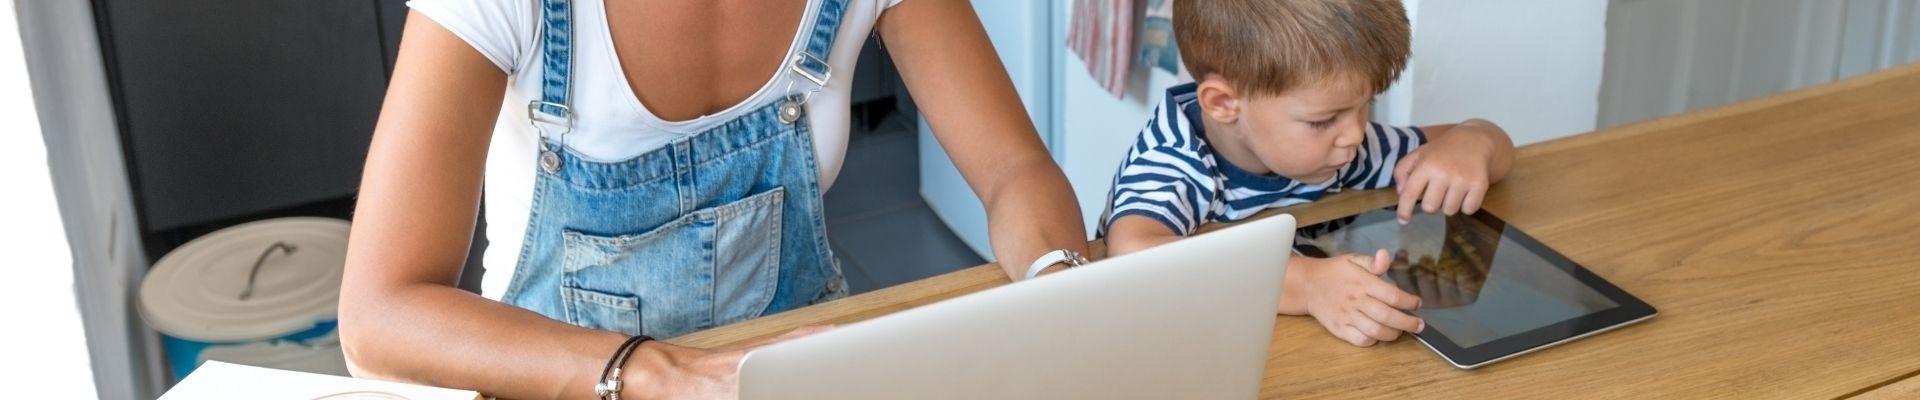 Mum on laptop, child on tablet